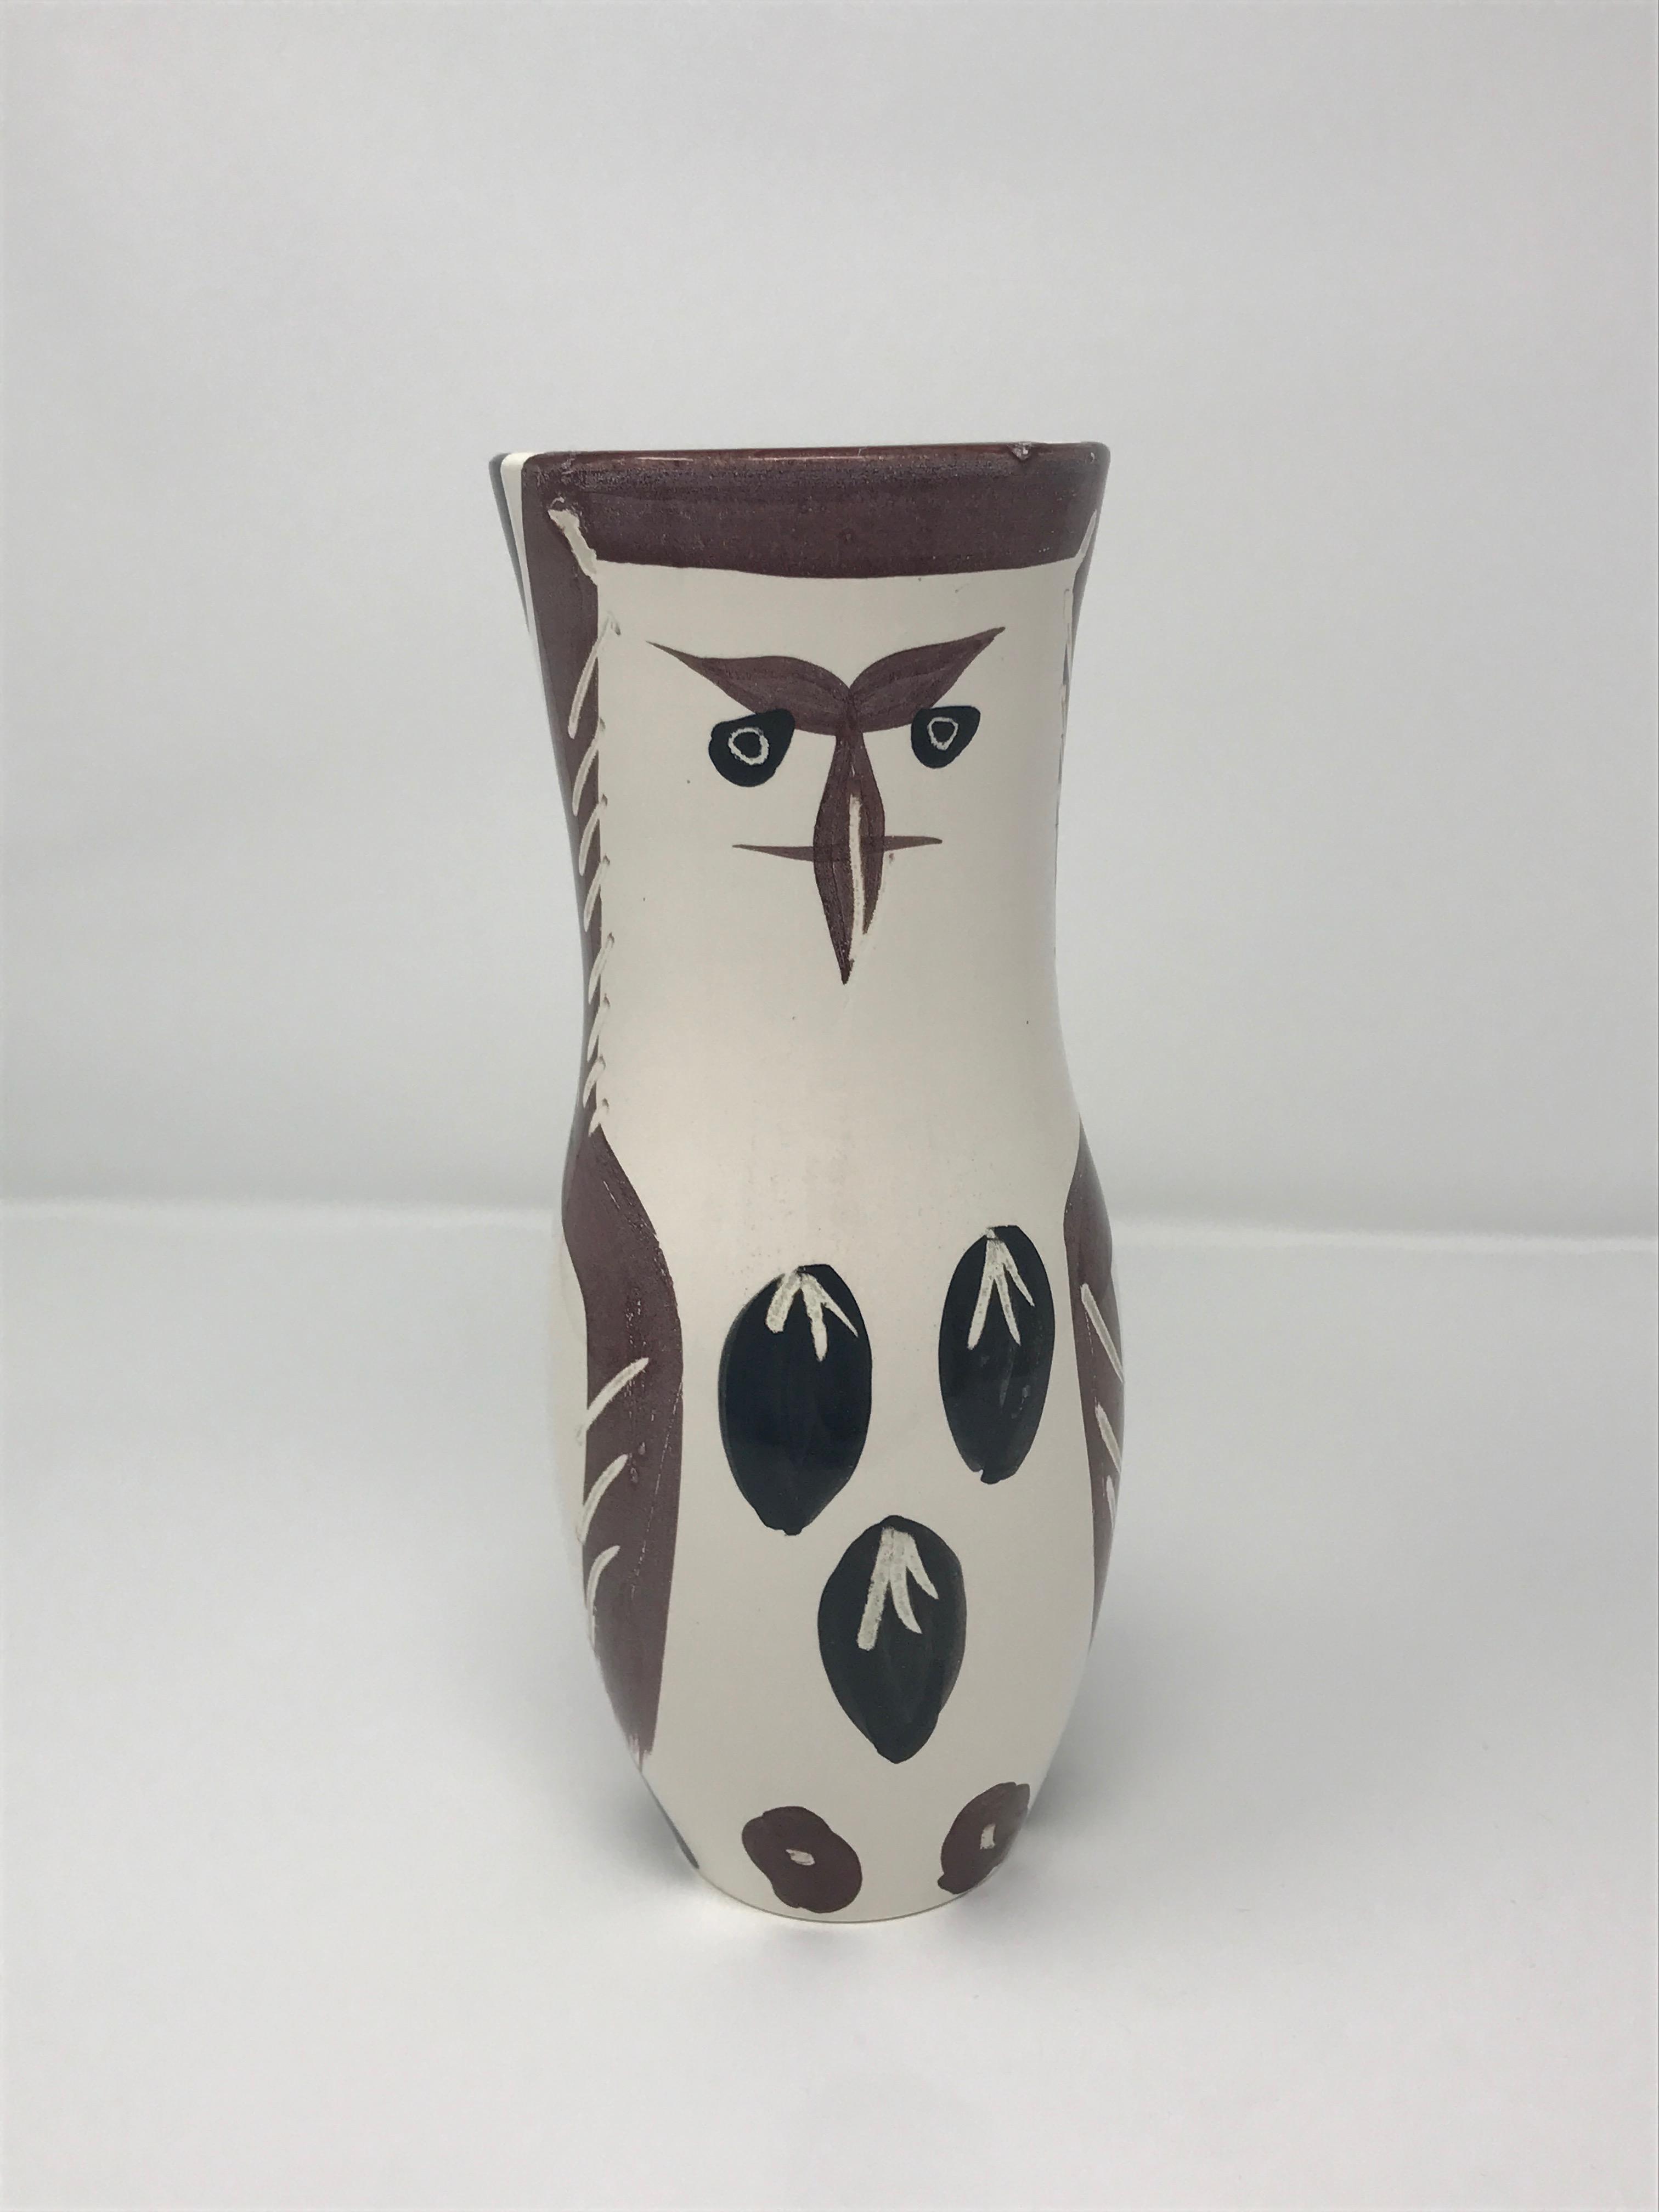 Picasso Madoura Ceramic Ramie 135 Chouetton Photorealism Artwork